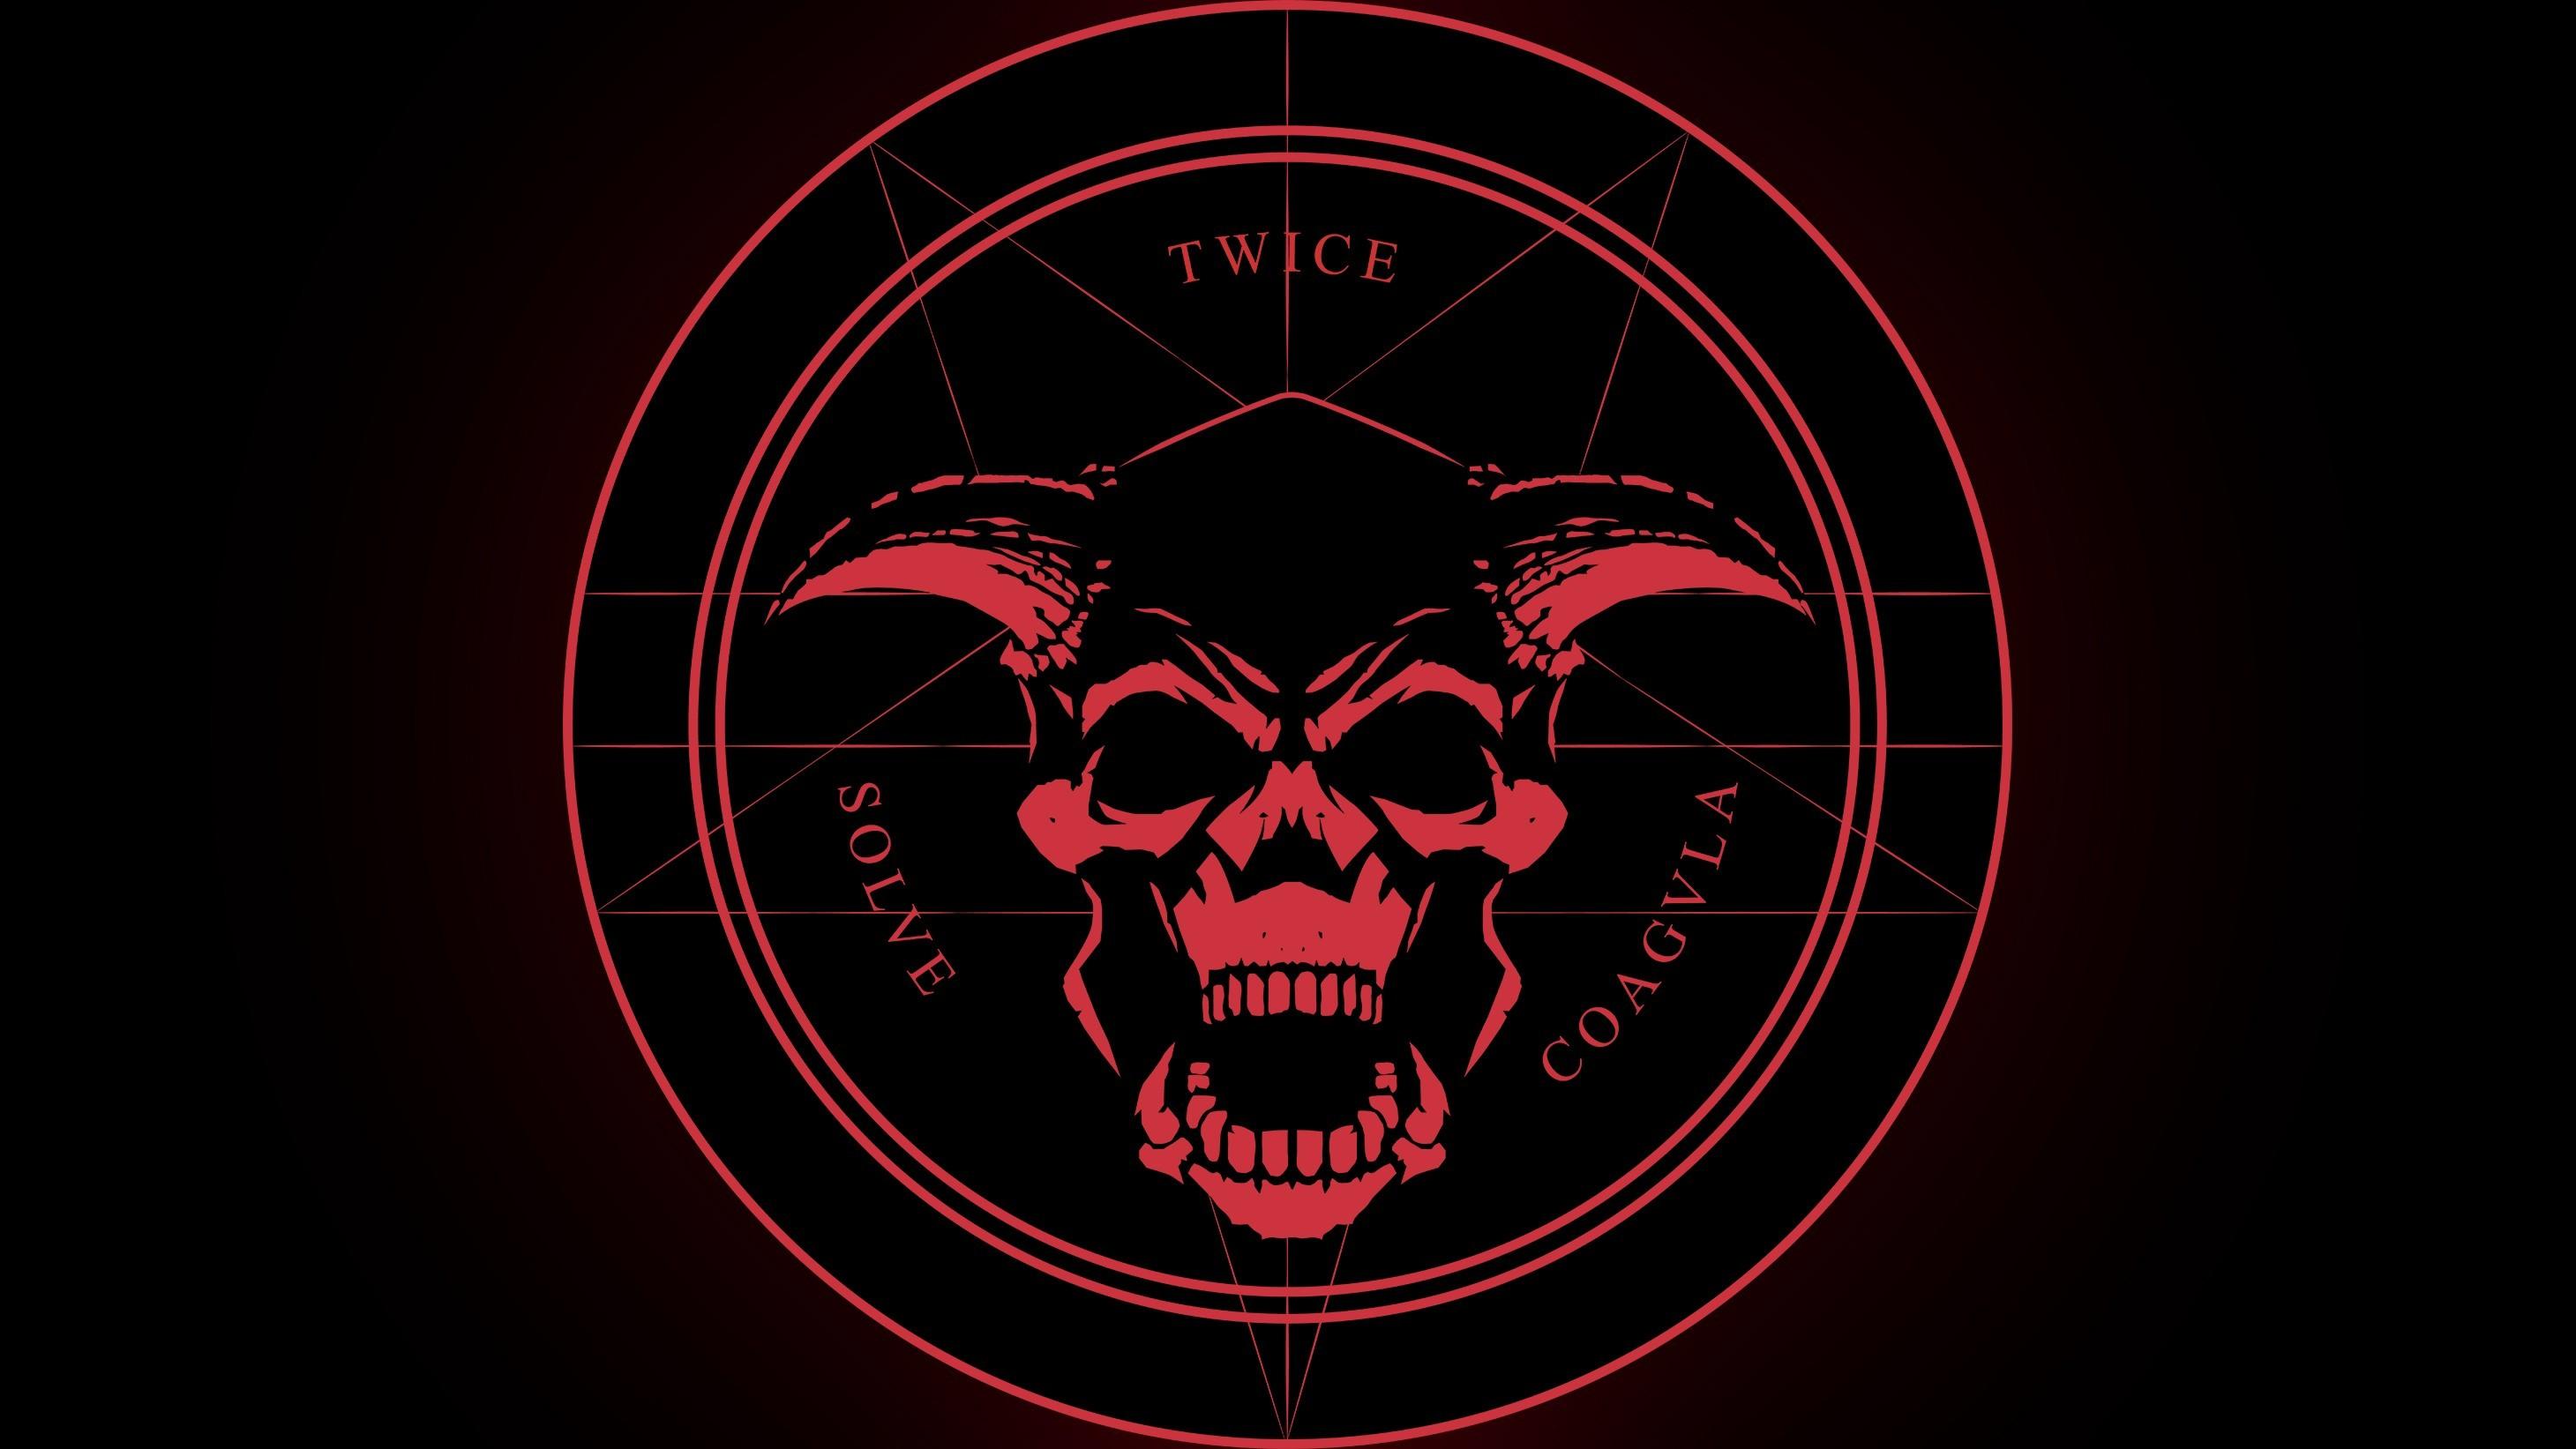 skull, Demon, Latin, Horned, Pentagram, Satanism, Devils, Satanic, Evil,  Doom (game) Wallpapers HD / Desktop and Mobile Backgrounds